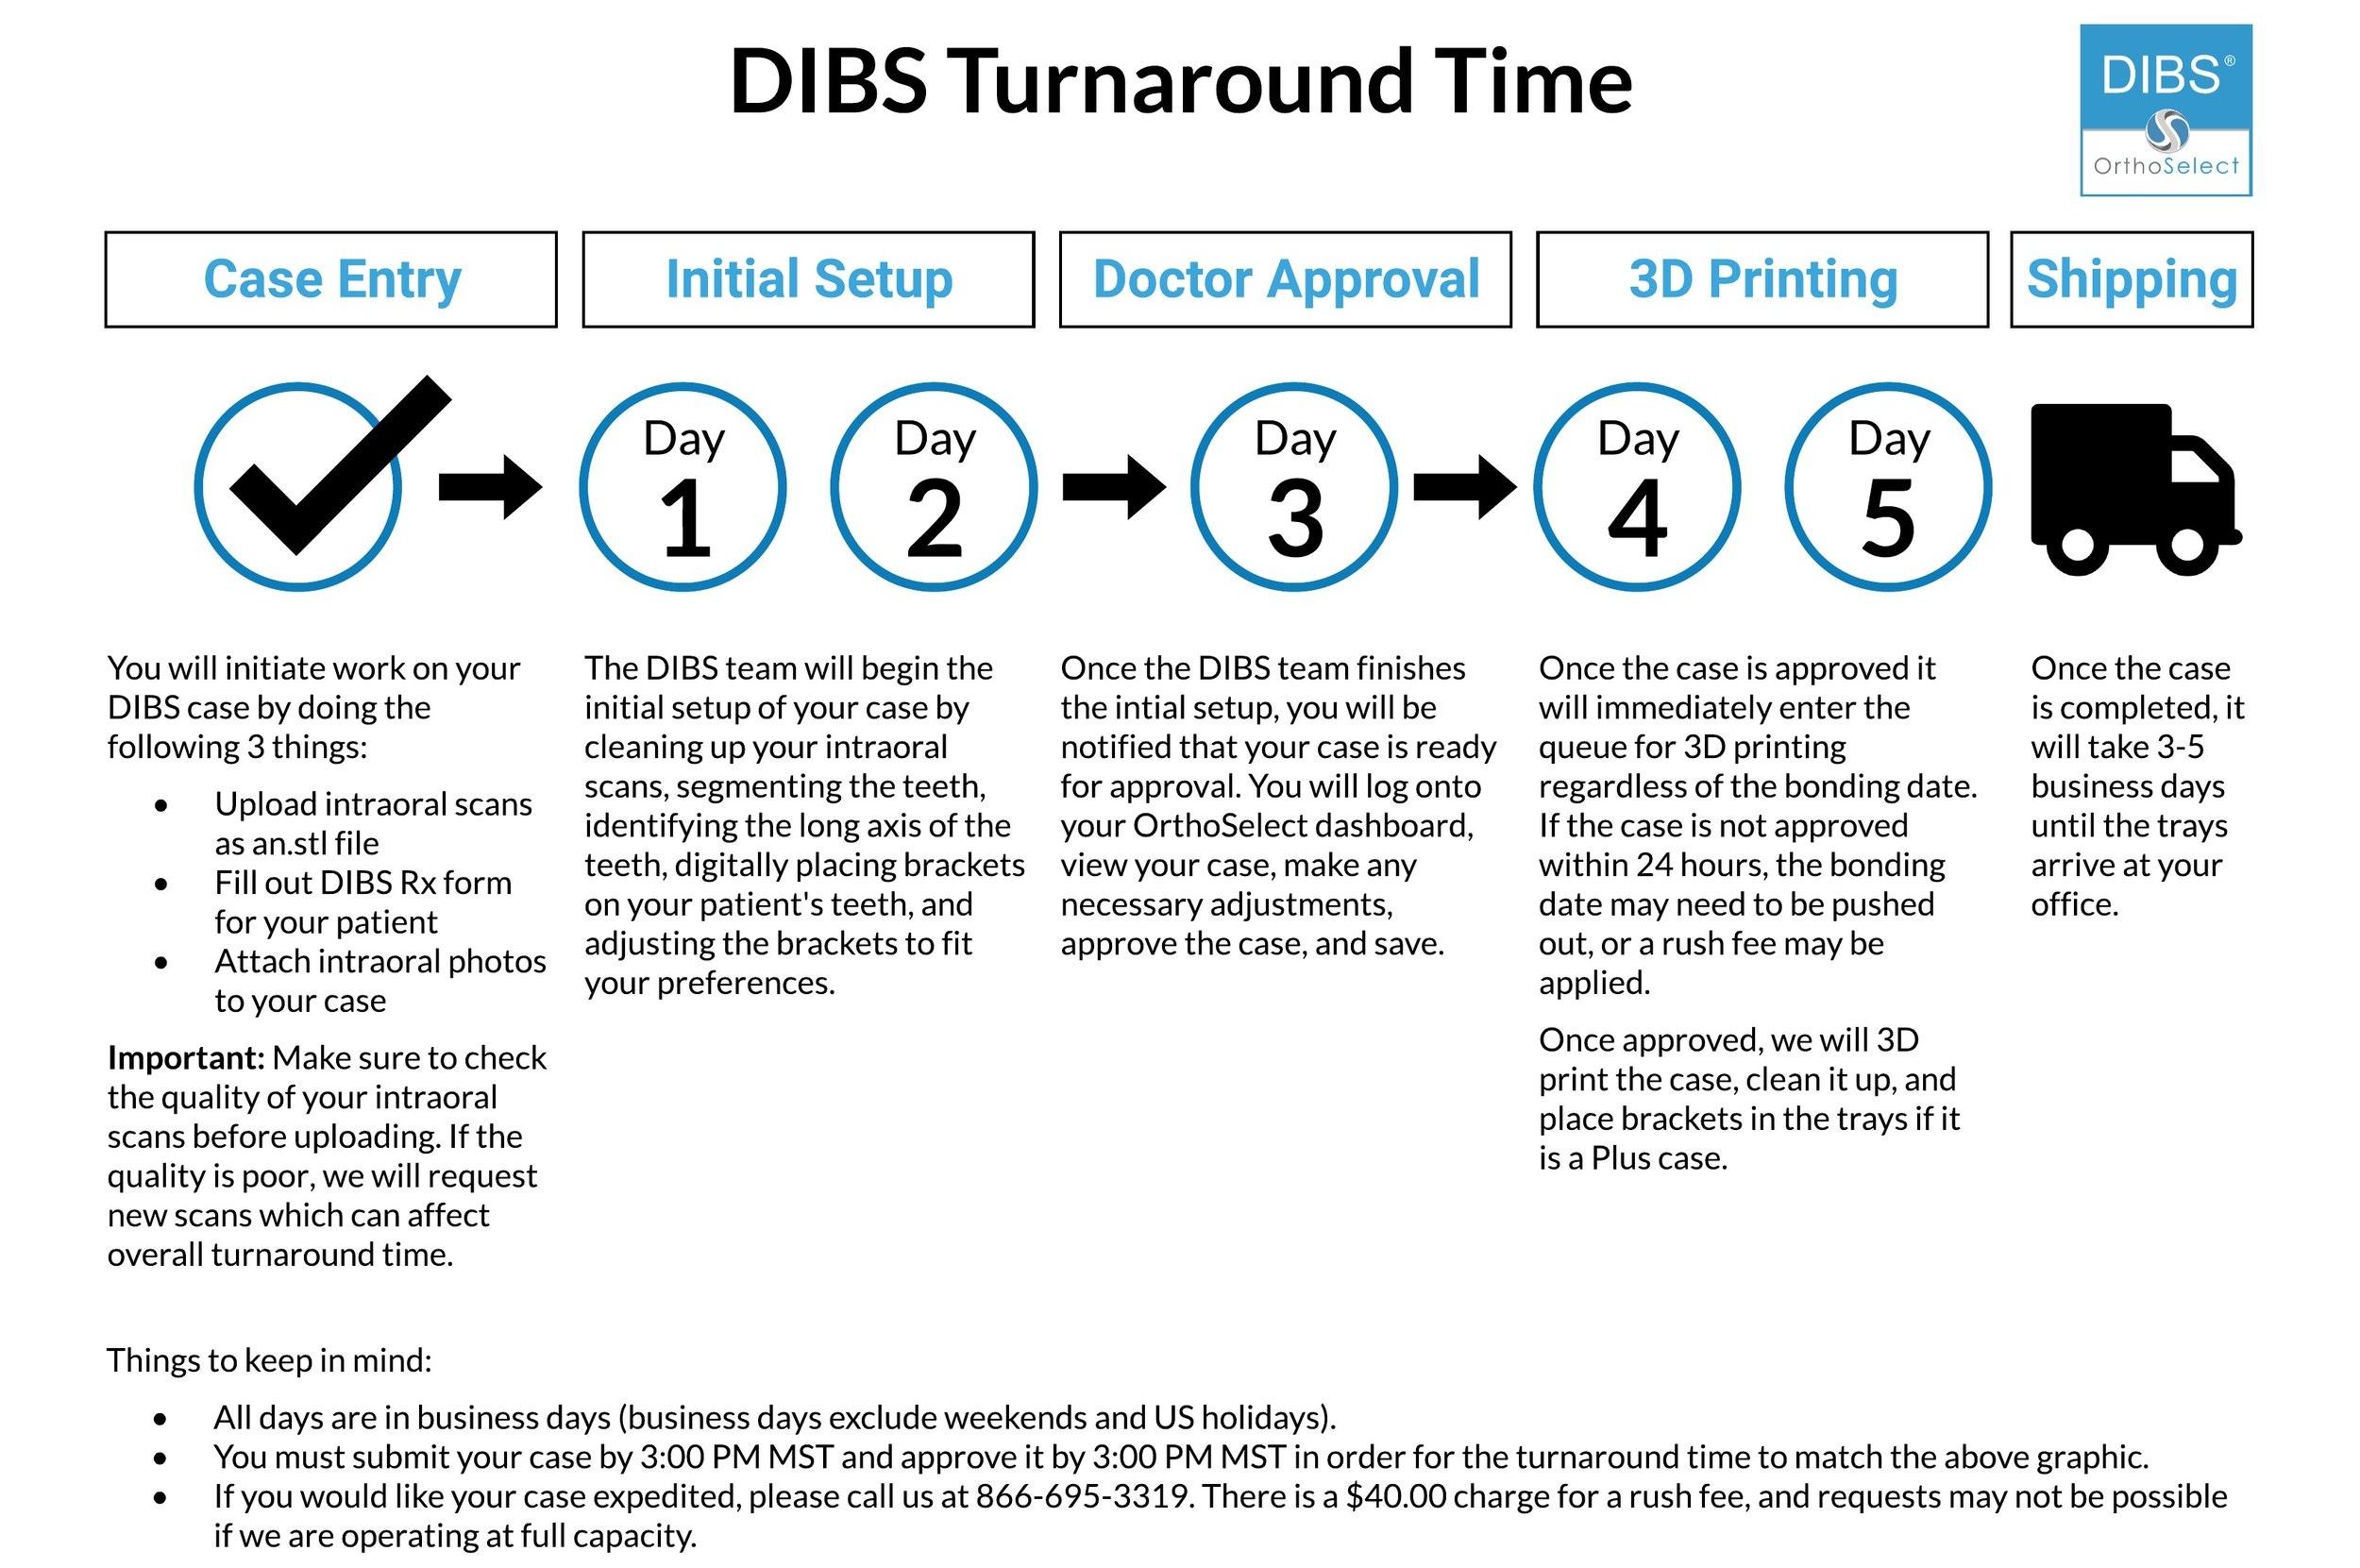 206+-+DIBS+Turnaround+Time+%281%29.jpg